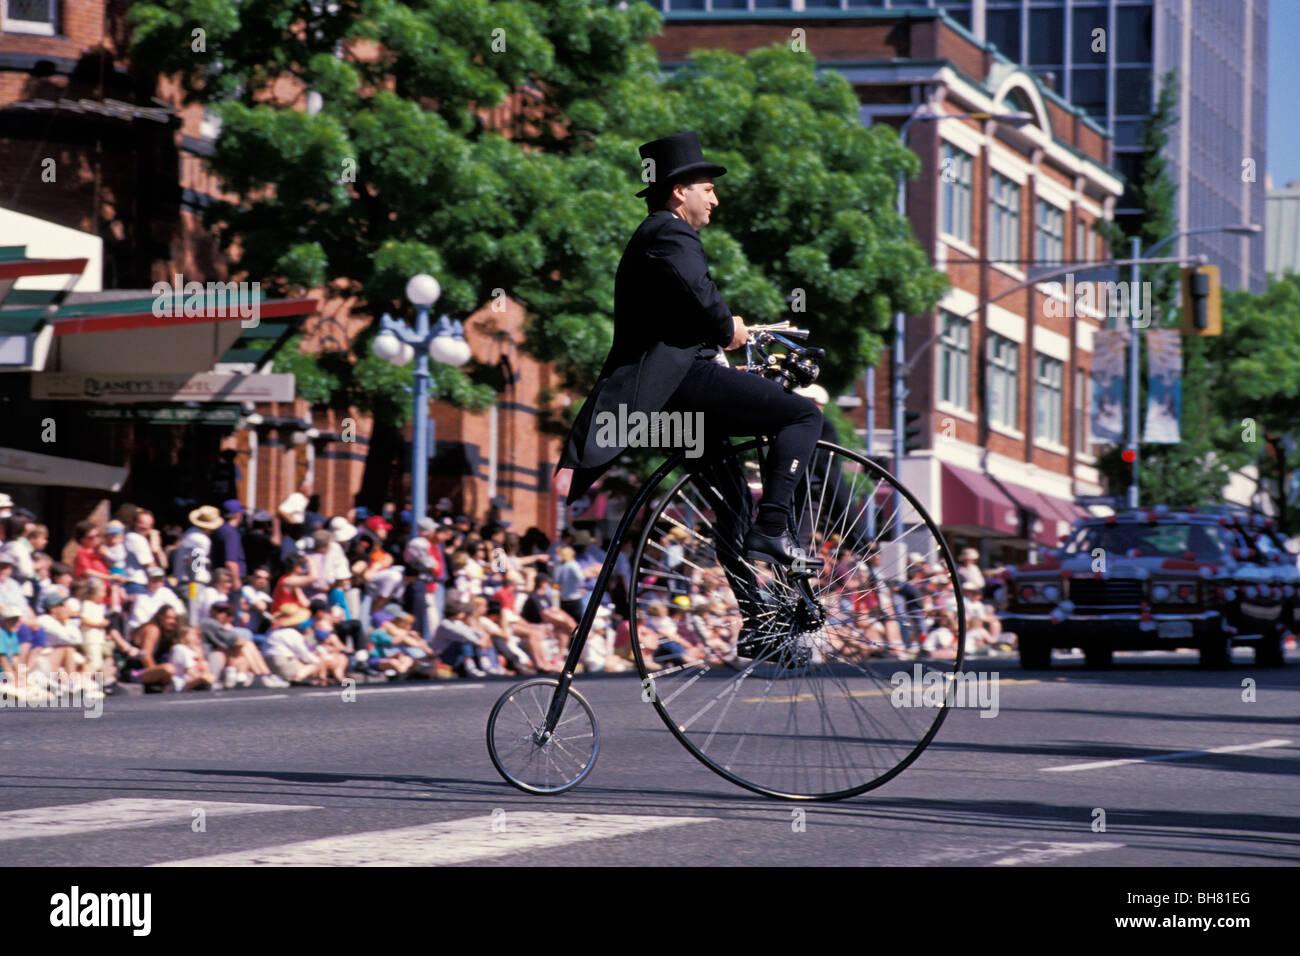 Man riding velocipede bicycle, Victoria Day parade, Victoria, British Columbia, Canada - Stock Image